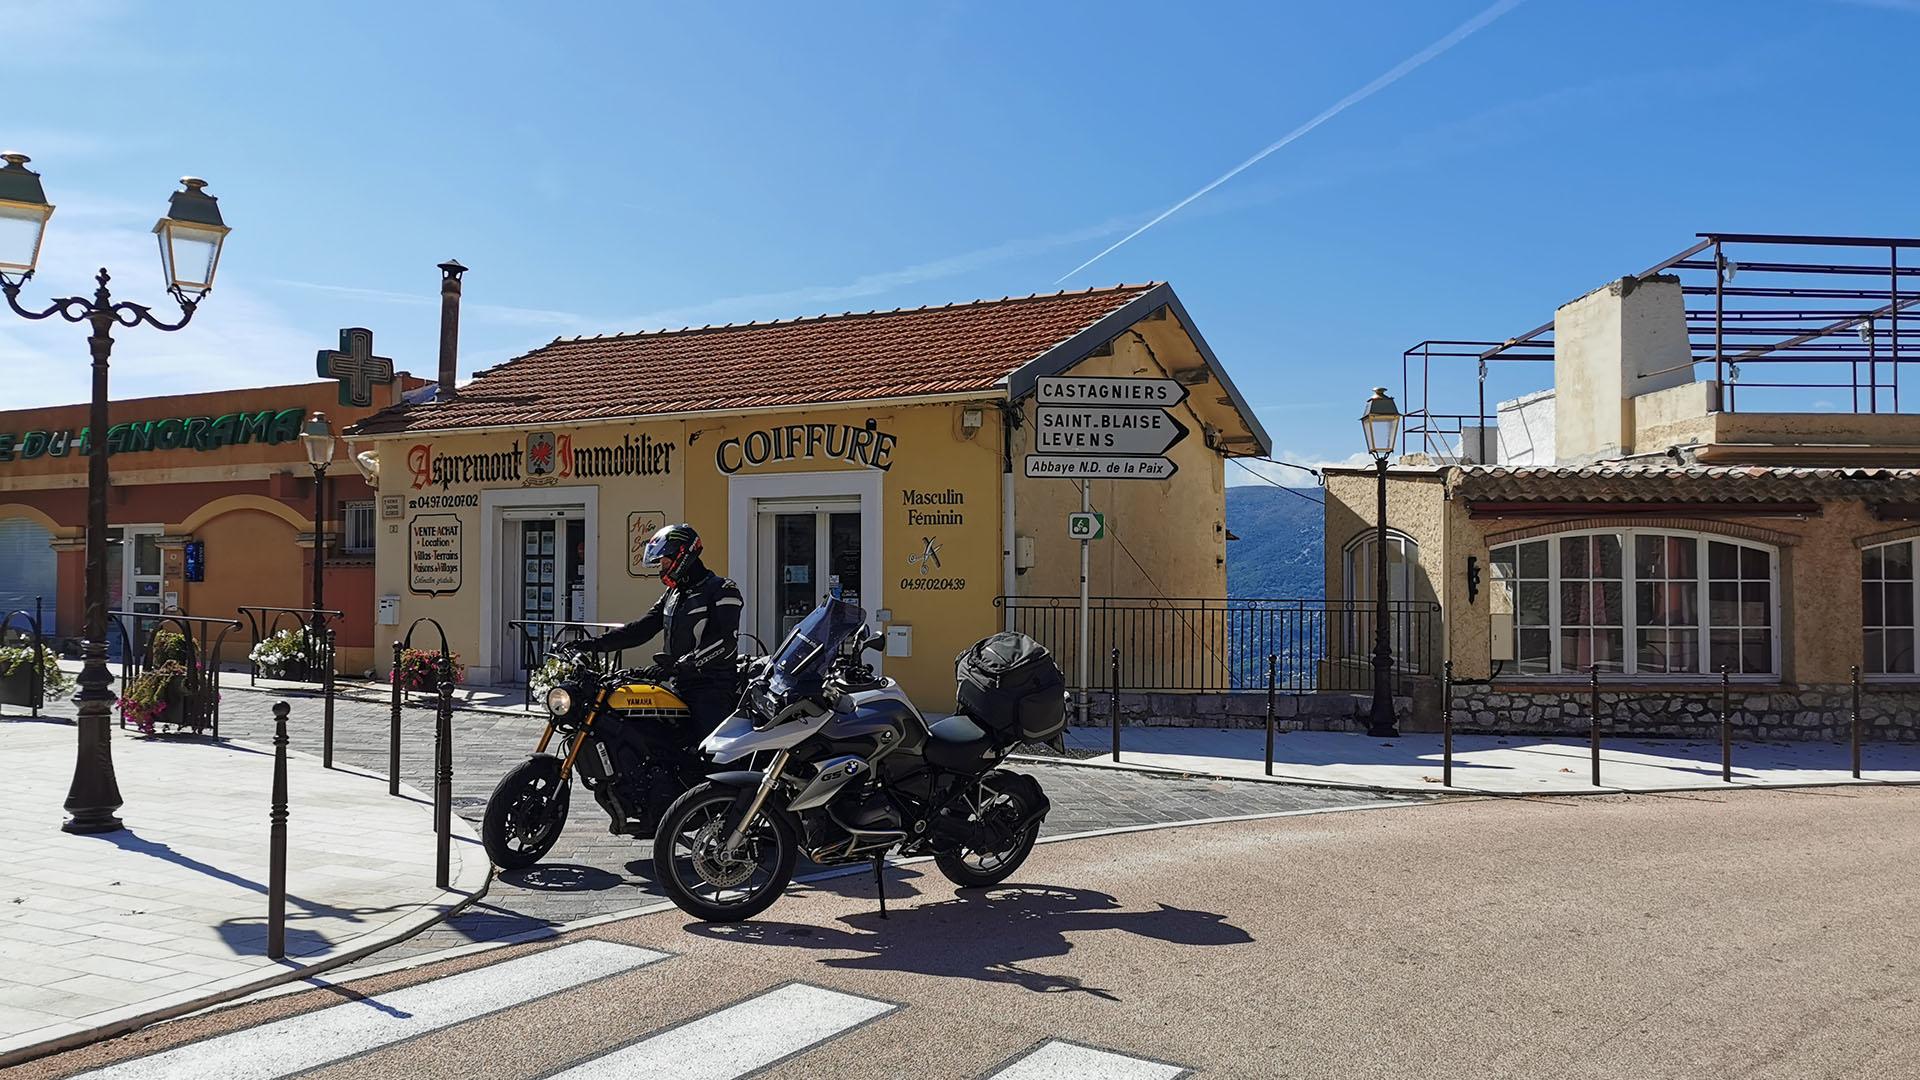 0501 - F - Col d'Aspremont